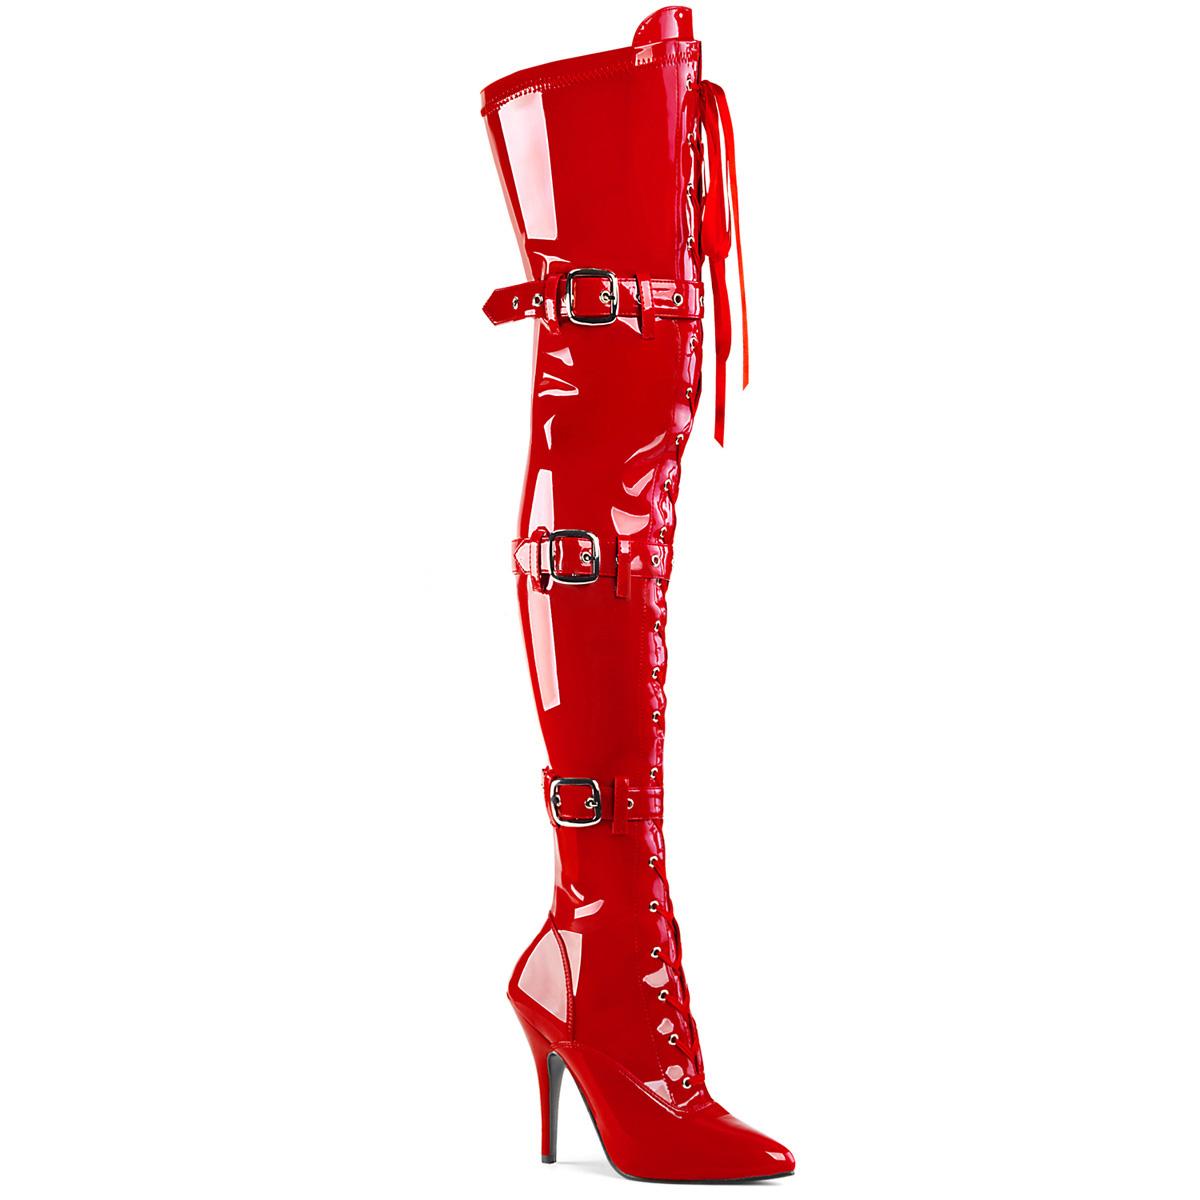 7997f4eff5ab52 Overknee Boot SEDUCE-3028 - Patent Red